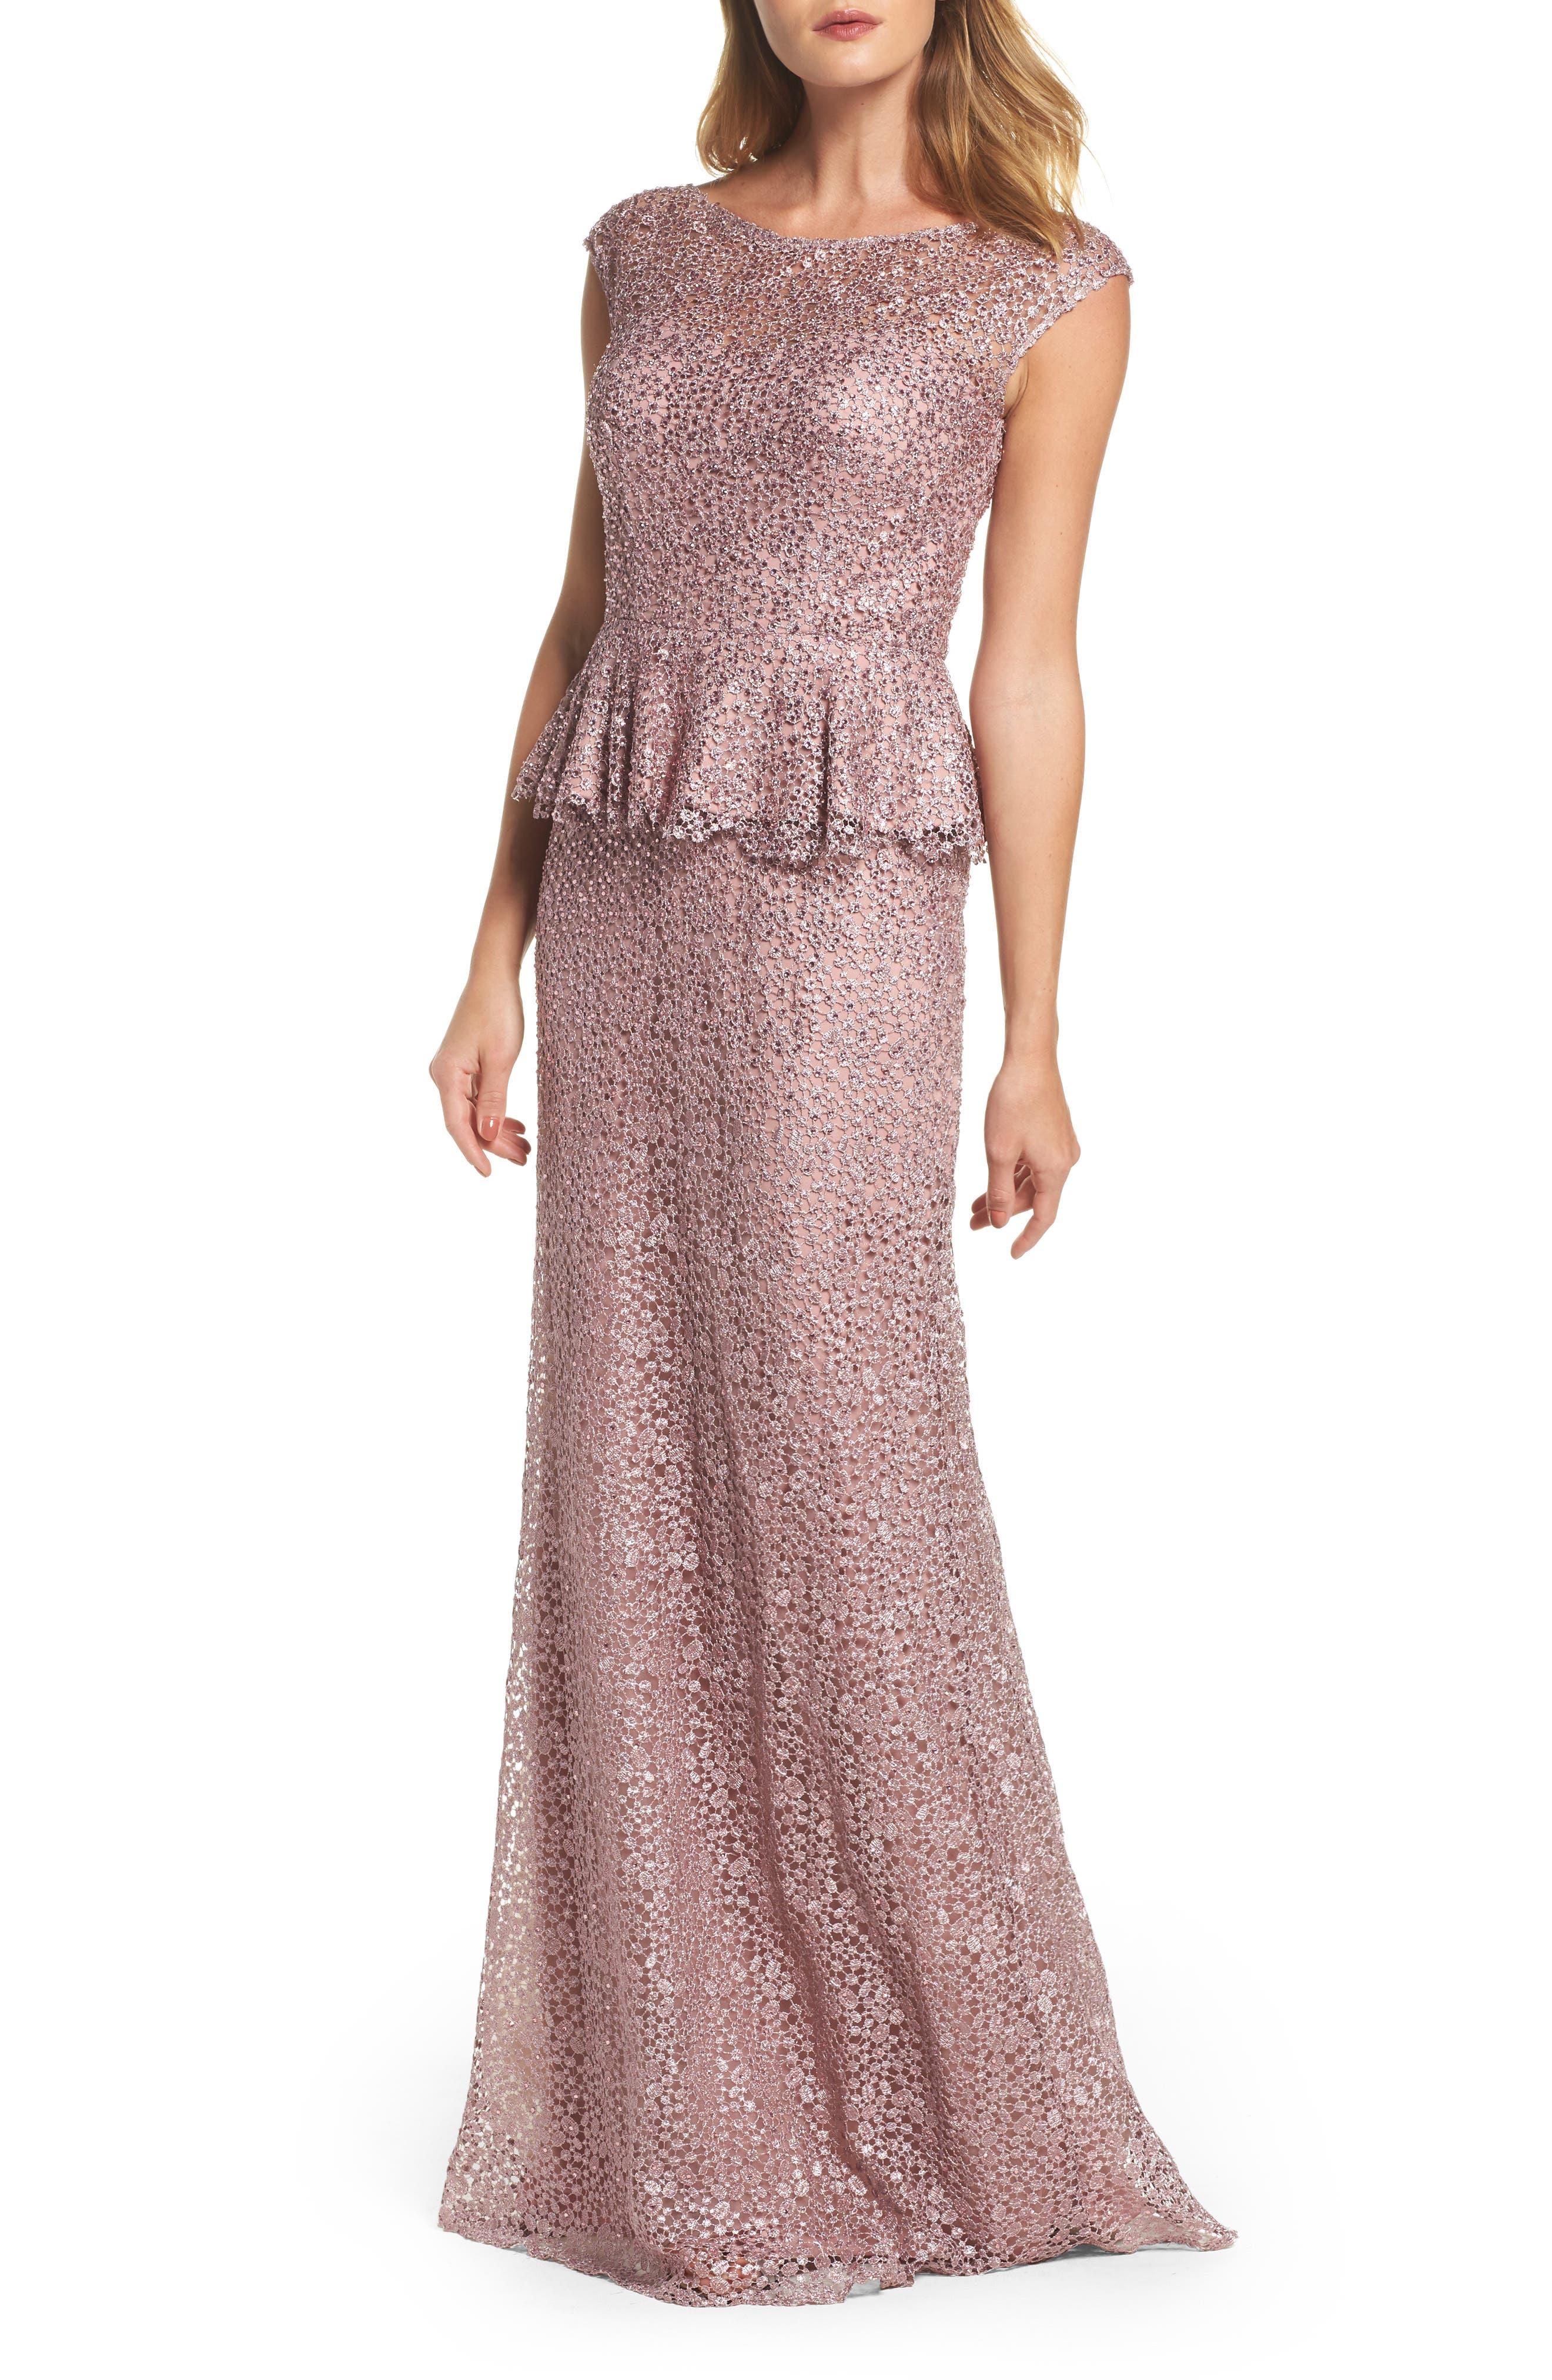 La Femme Embellished Lace Peplum Gown, Purple